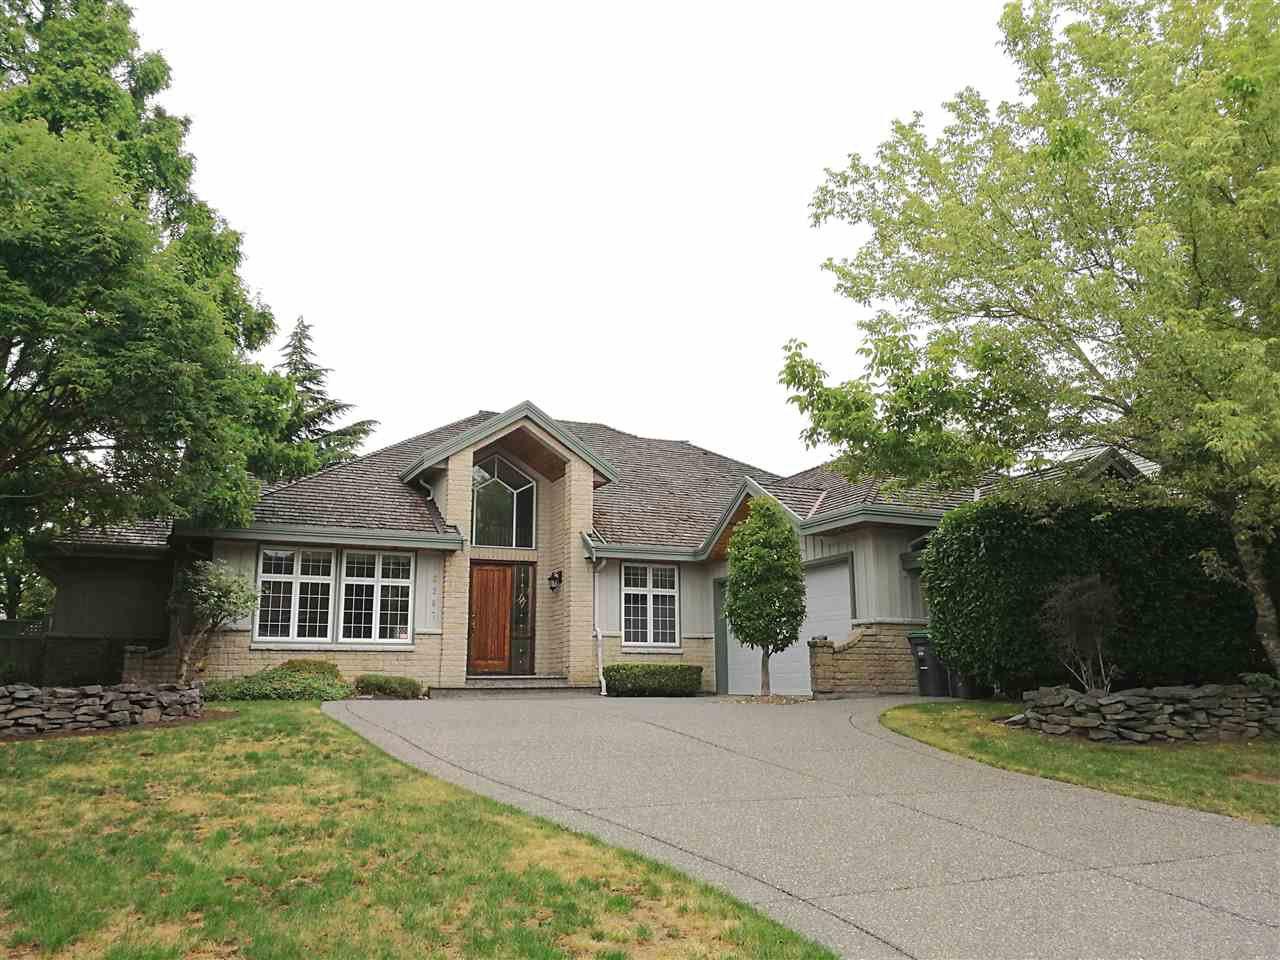 Main Photo: 16267 MORGAN CREEK Crescent in Surrey: Morgan Creek House for sale (South Surrey White Rock)  : MLS®# R2385961